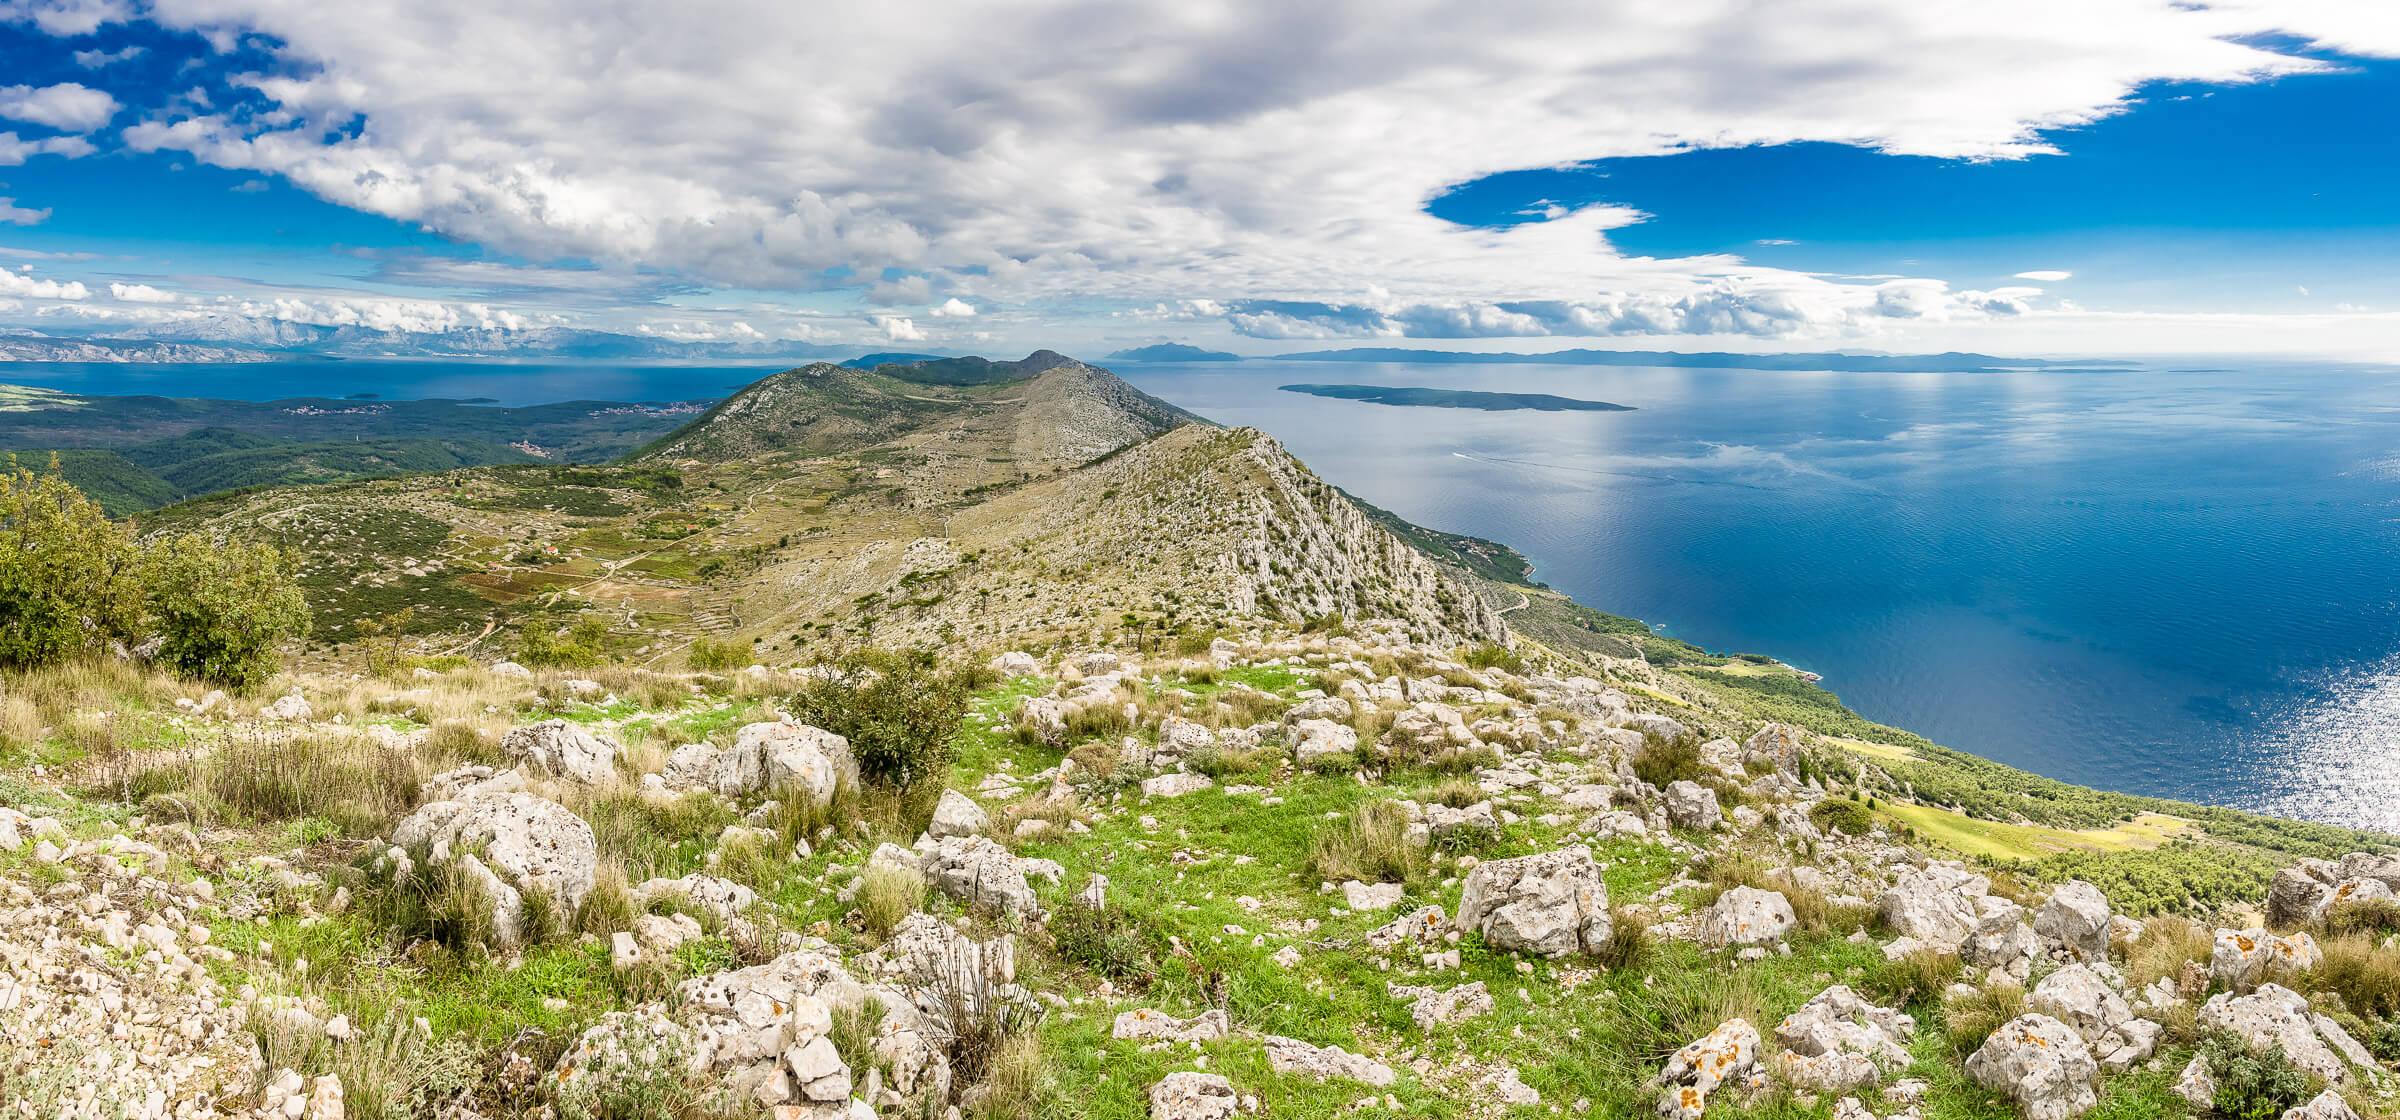 View of the island of Hvar, Croatia, from its highest peak - St. Nicolas